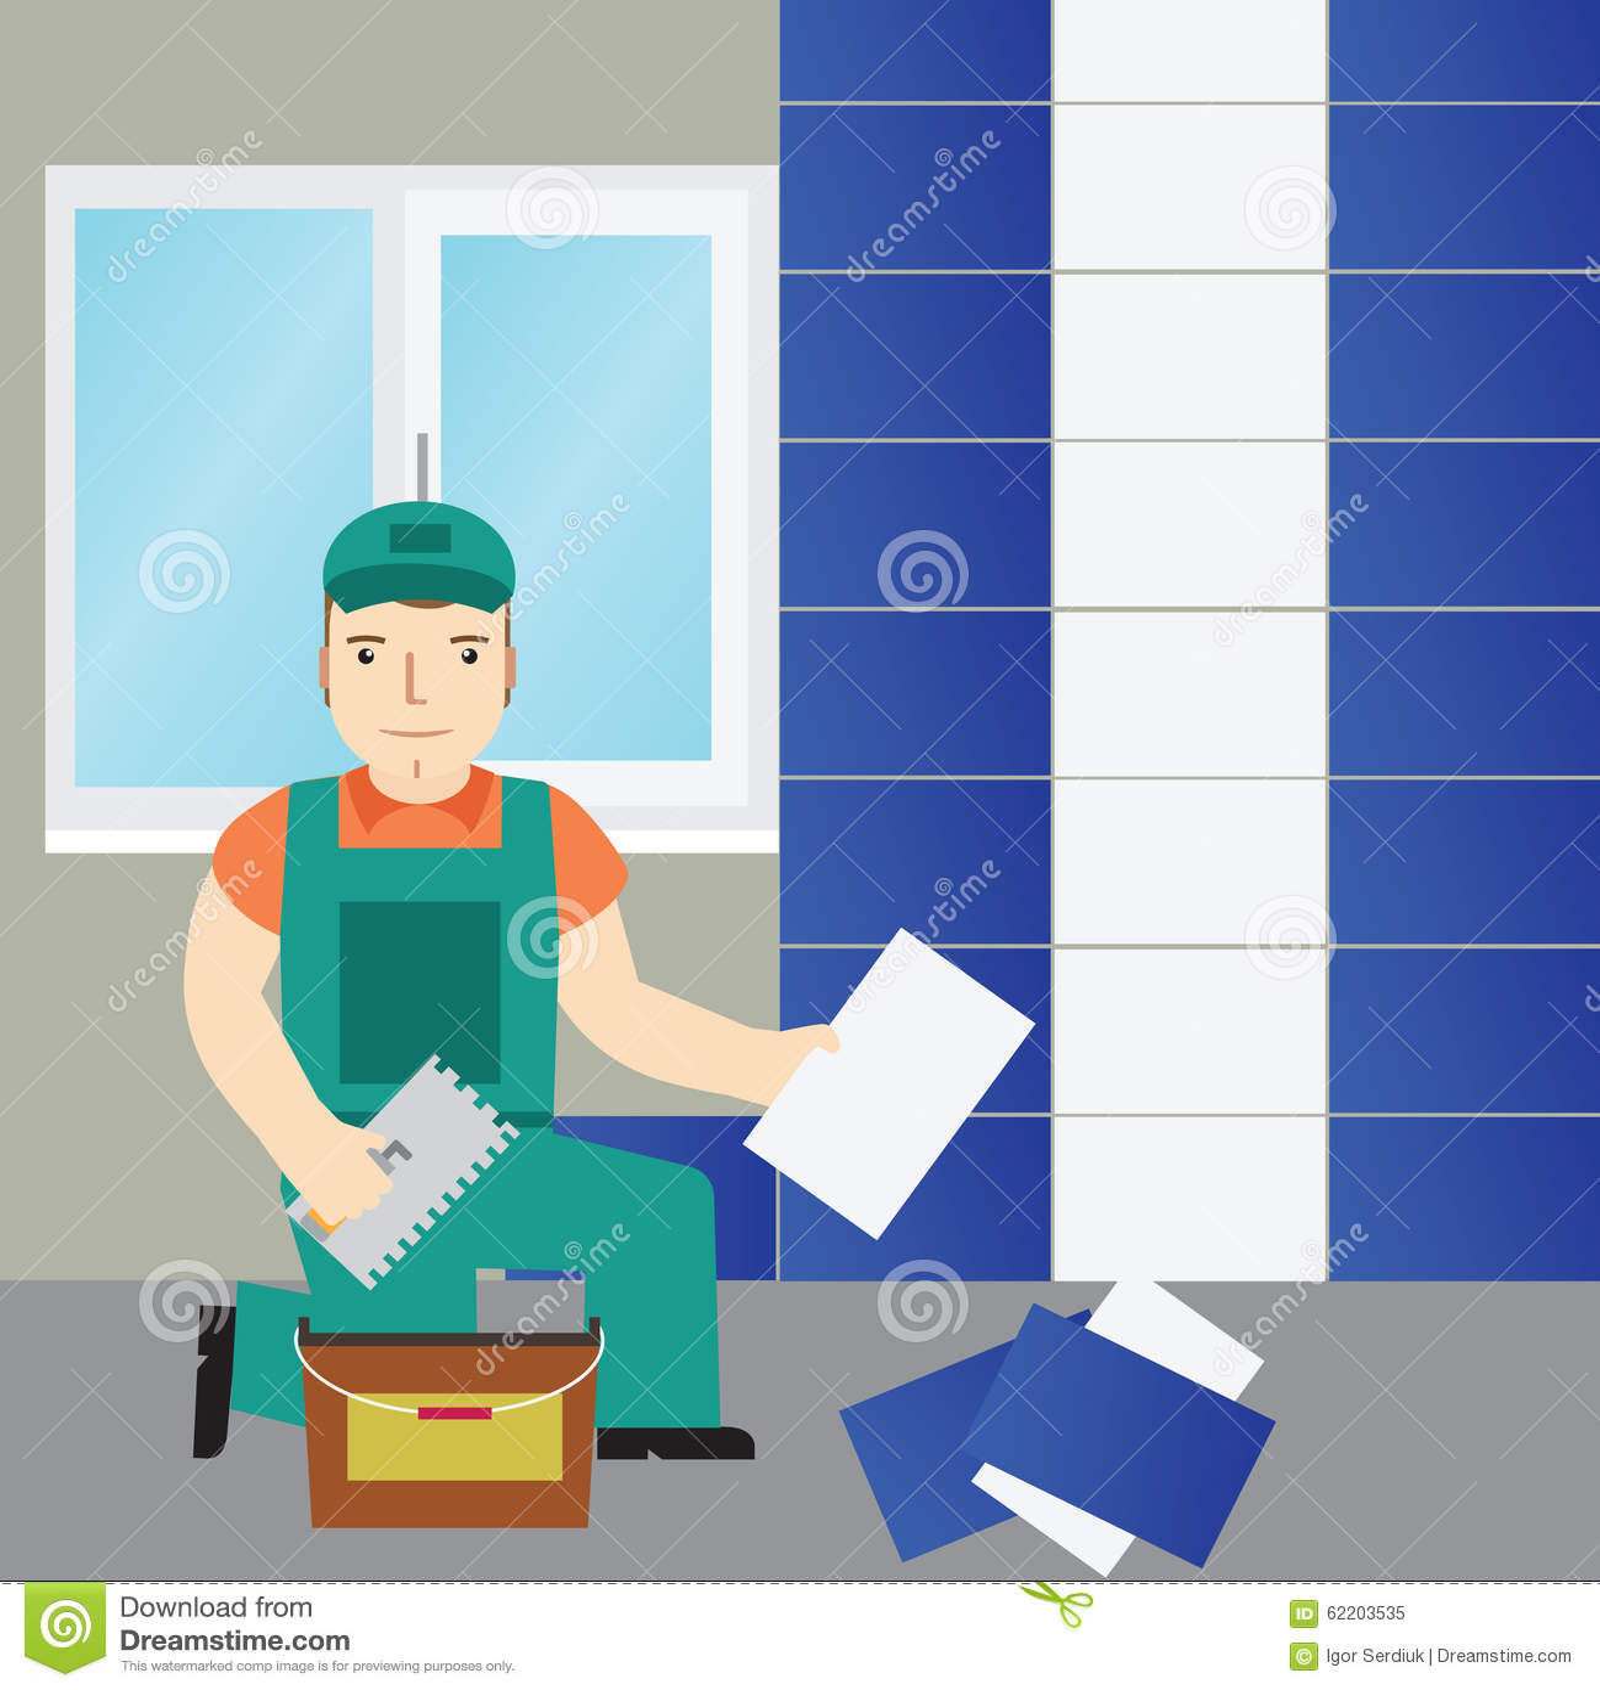 Icon Tile Work : Tiler work to lay down tile flat icon stock vector